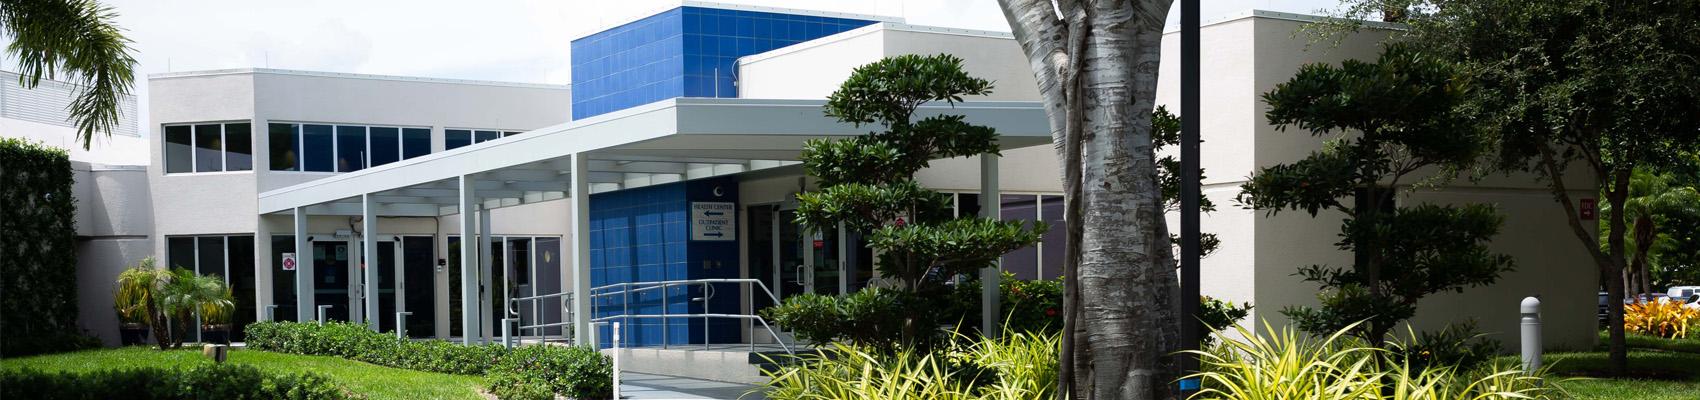 Senior Health Care Services Delray Beach FL Harbour s Edge